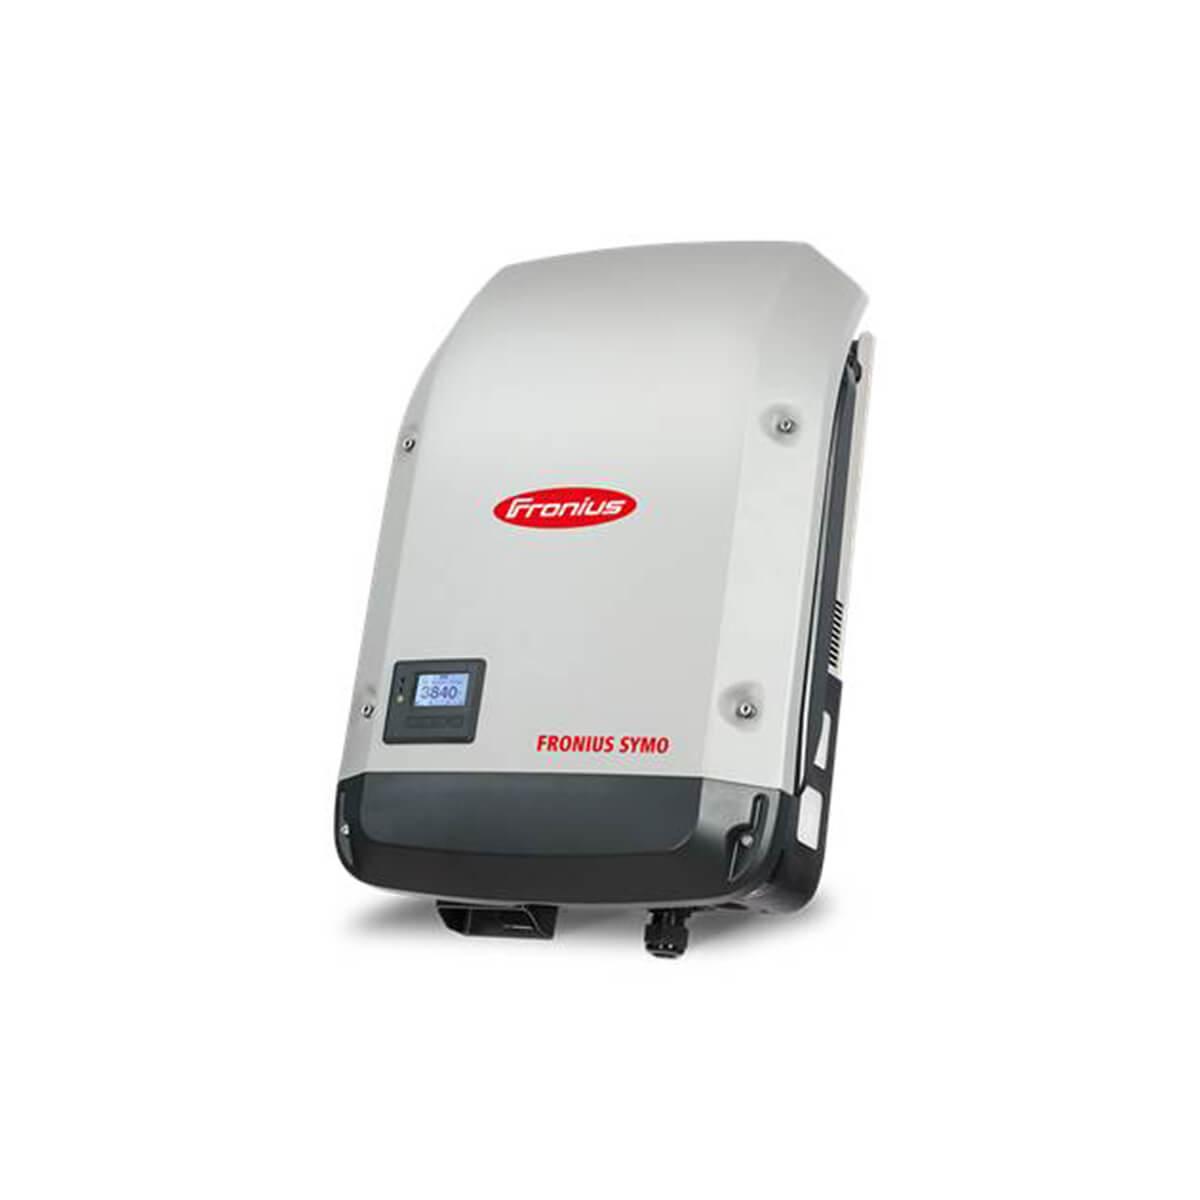 fronius 15kW inverter, fronius symo 15kW inverter, fronius symo 15.0-3-m inverter, fronius symo 15.0-3-m, fronius symo 15 kW